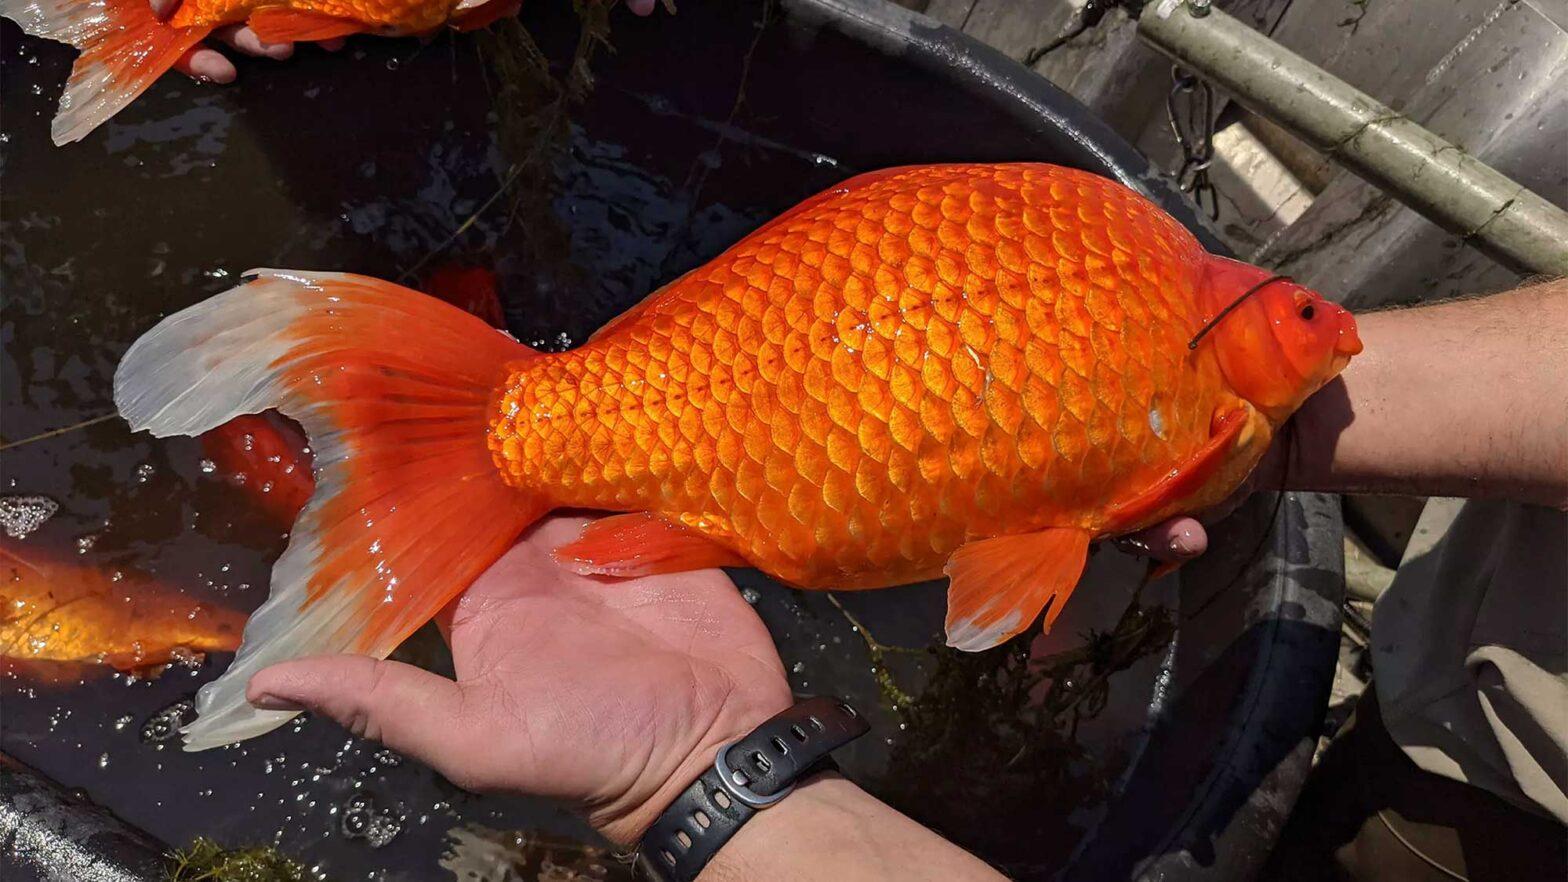 Football Sized Goldfish Minnesota Lakes